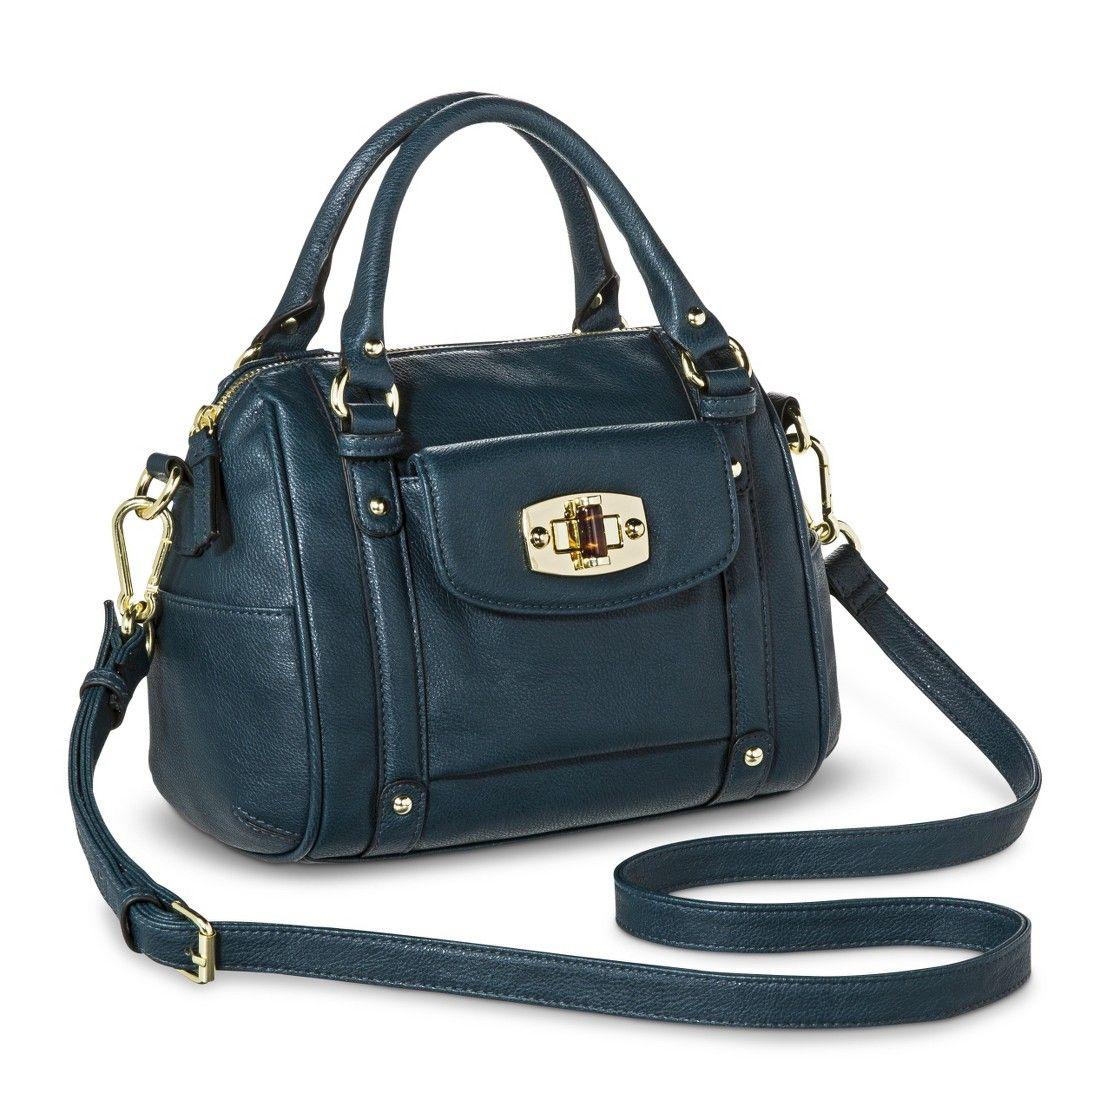 8a5ad6e08a Merona  Mini Satchel Handbag with Removable Crossbody Strap